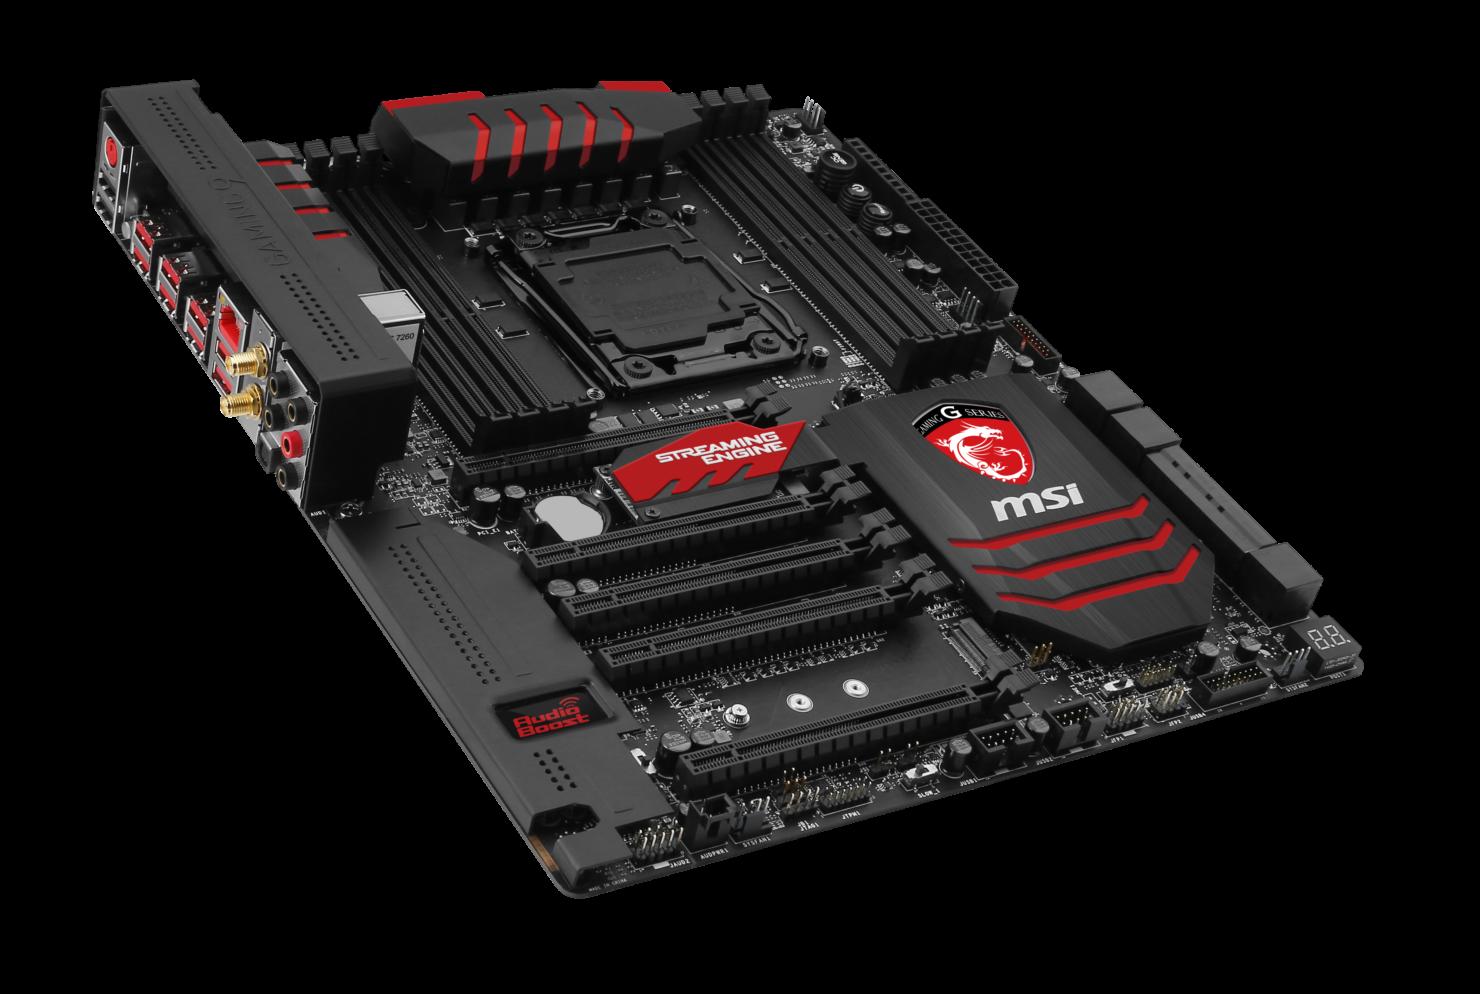 msi-x99s-gaming-9-ac-motherboard_1